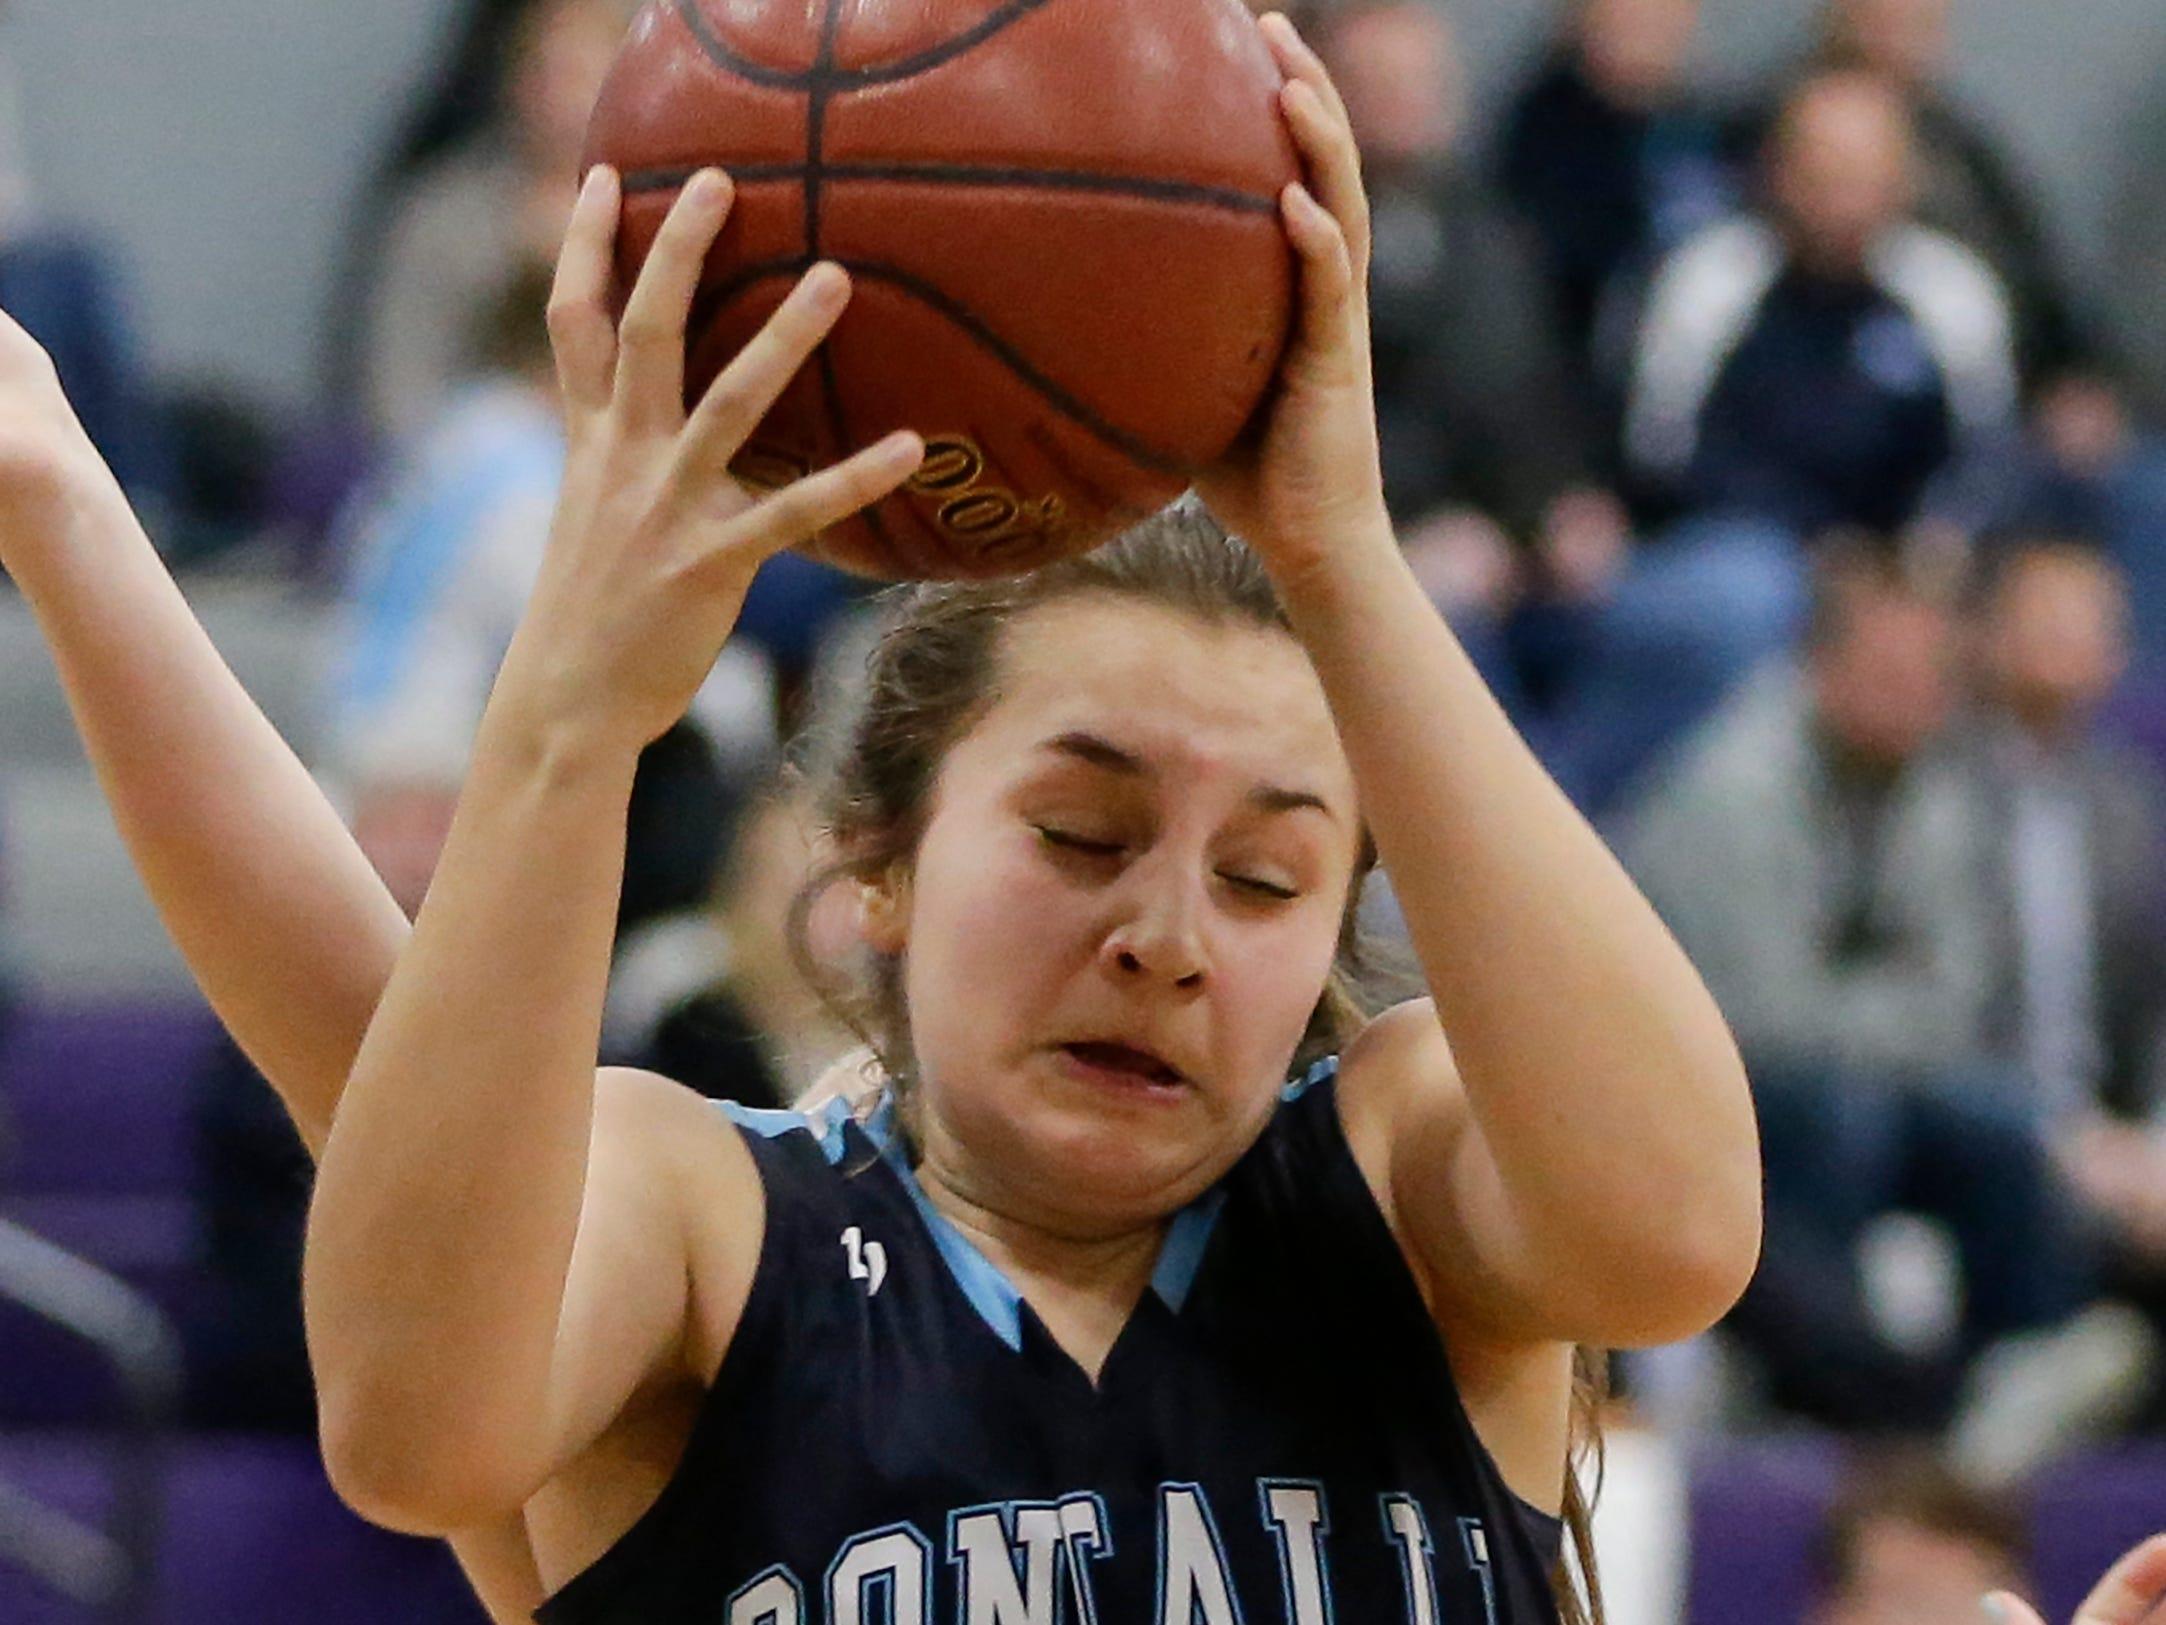 Roncalli's Lily Nelson rebounds against Kiel during an EWC matchup at Kiel High School Thursday, January 17, 2019, in Kiel, Wis. Joshua Clark/USA TODAY NETWORK-Wisconsin